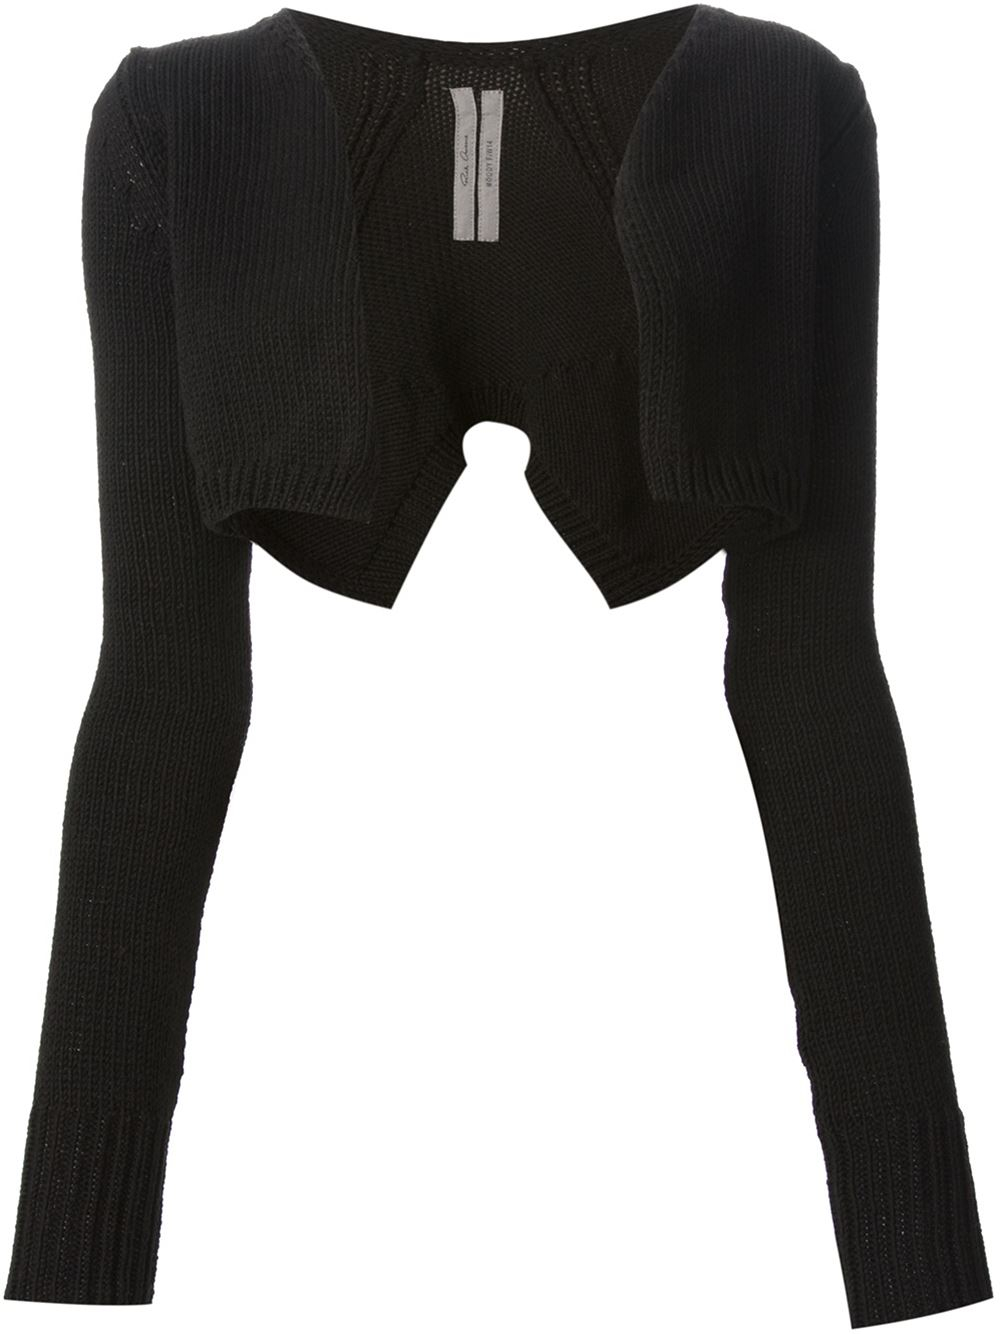 Lyst - Rick Owens Short Butterfly Cardigan in Black b0217f50d